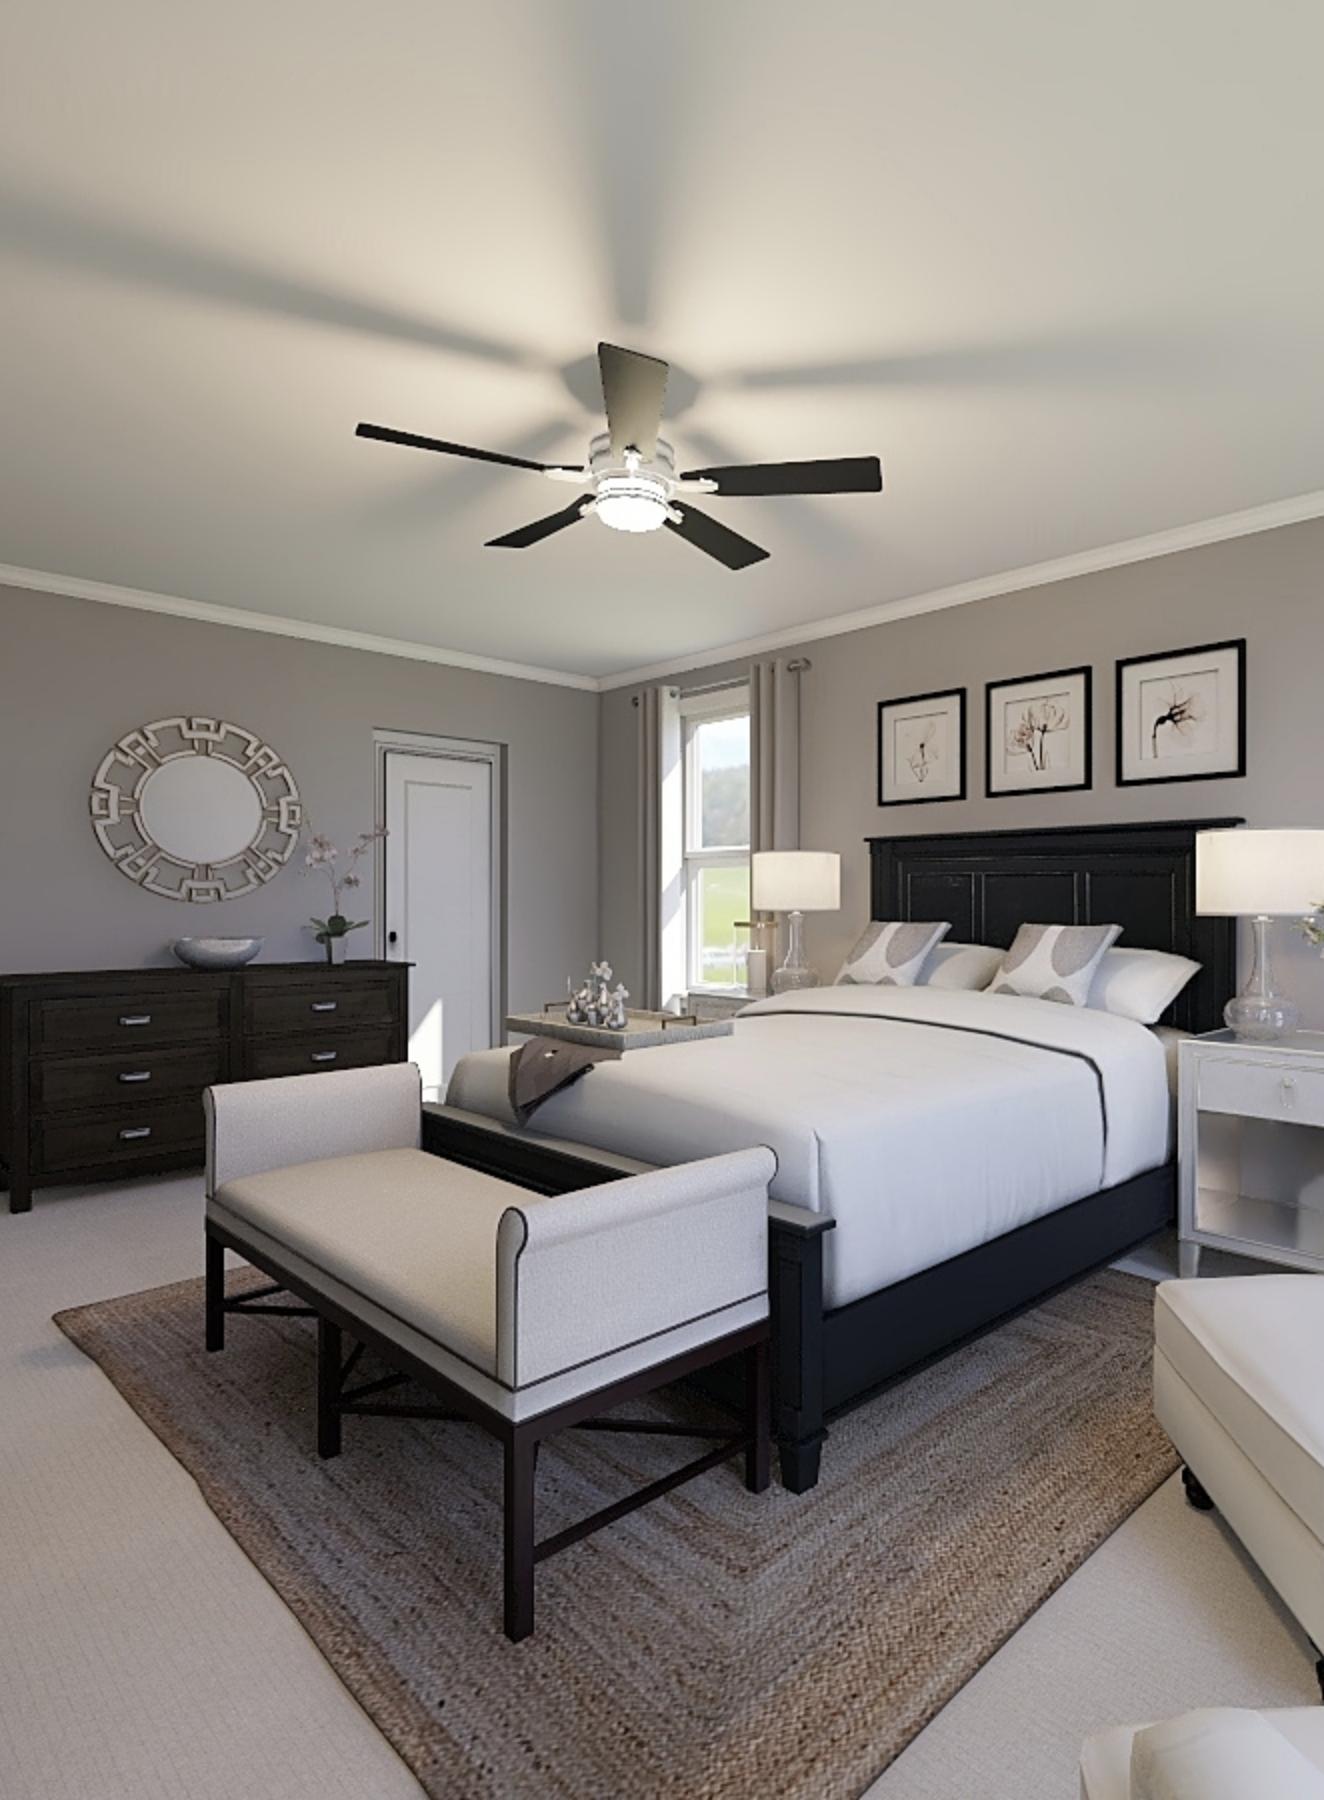 Design Your Dream Bedroom On Homestyler